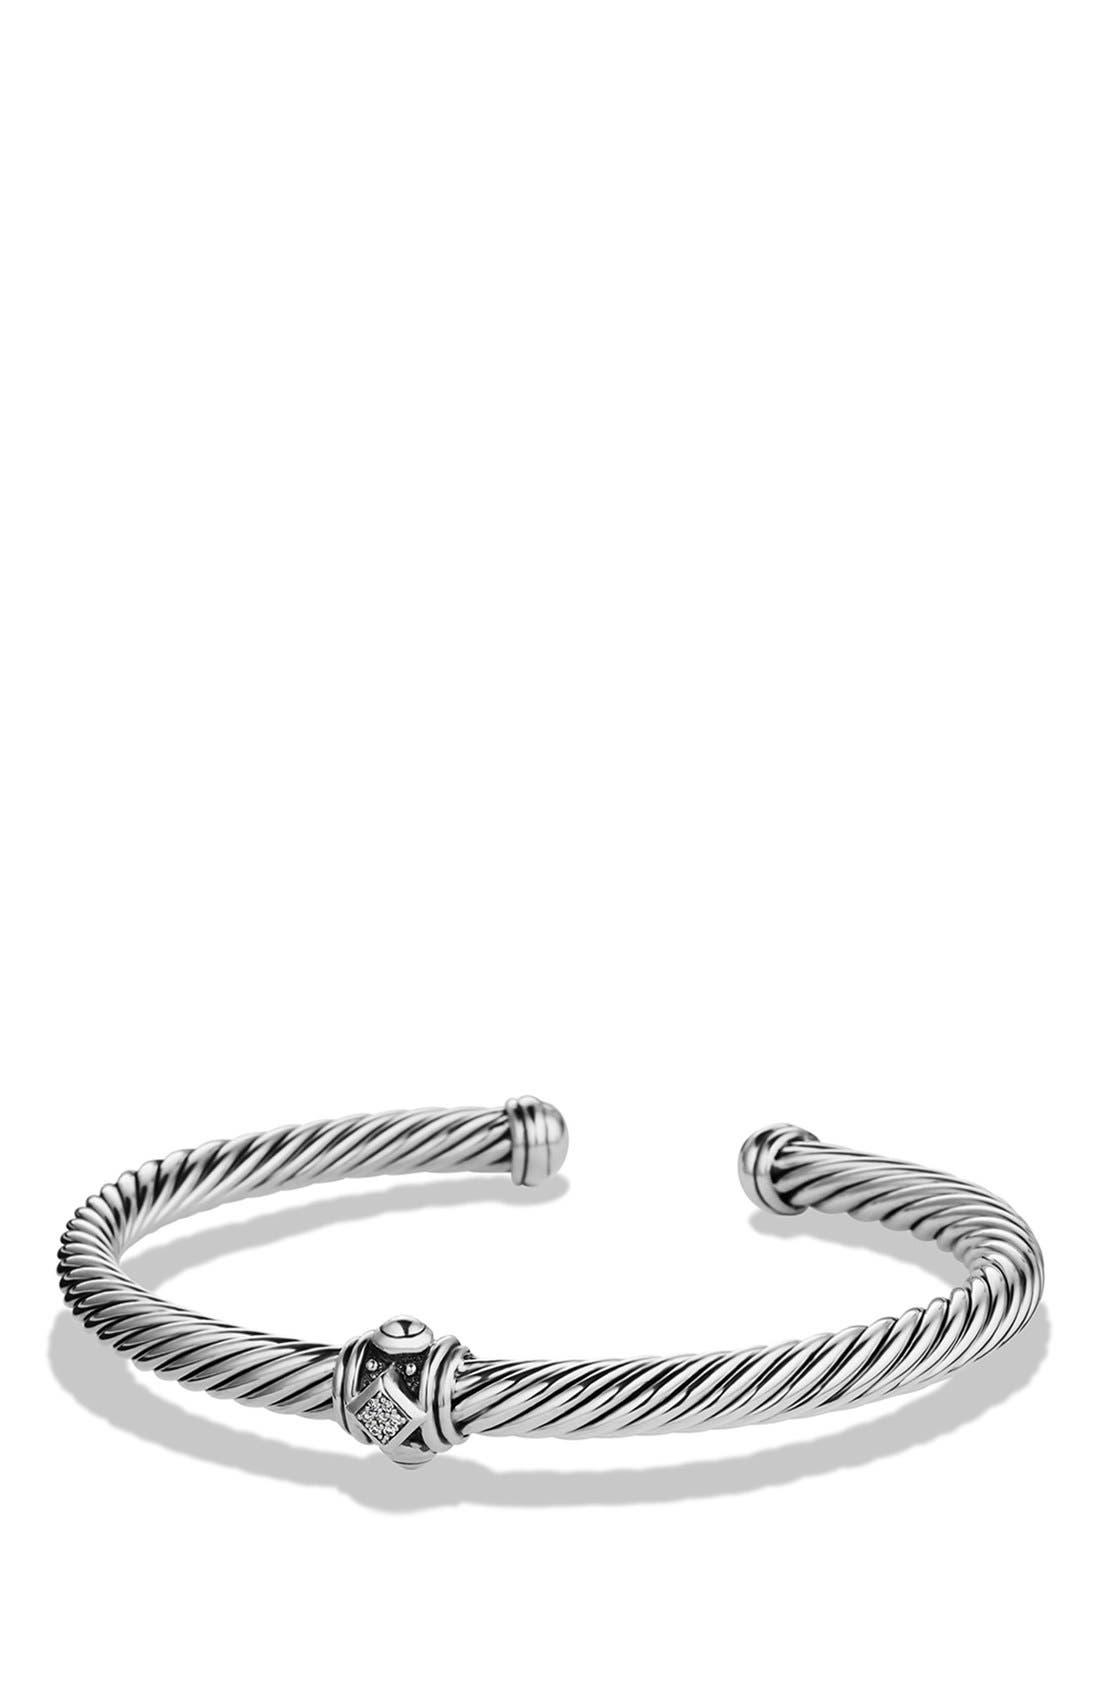 Alternate Image 1 Selected - David Yurman 'Renaissance' Bracelet with Diamonds